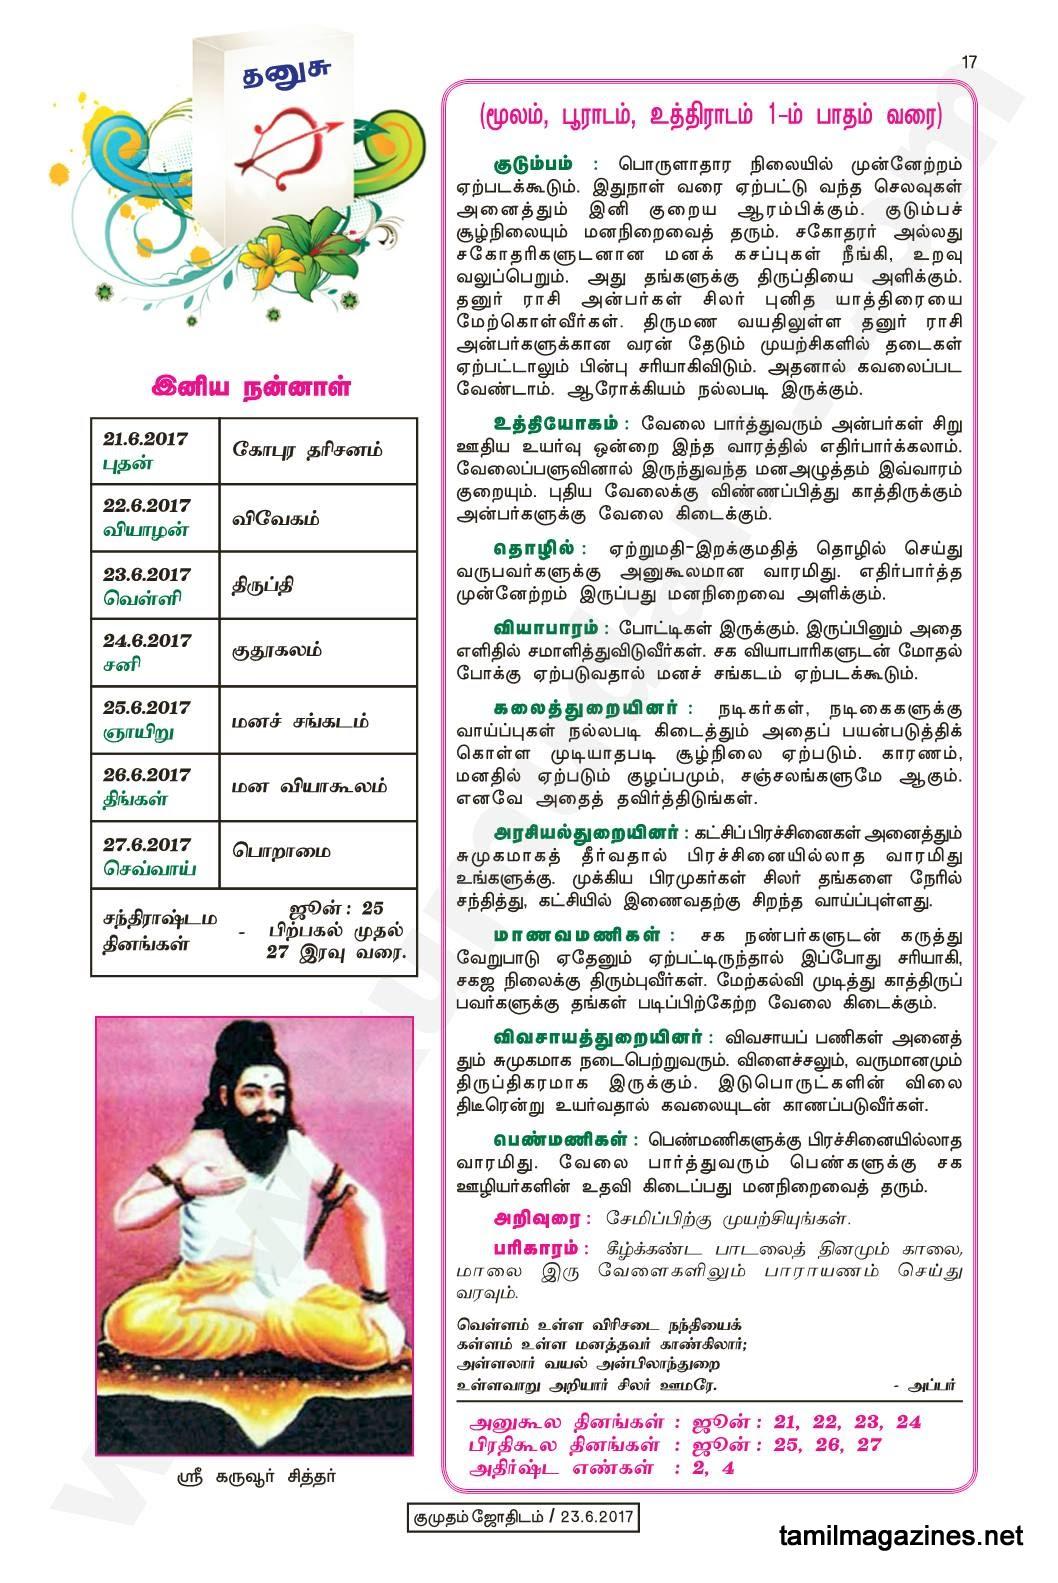 Kumudam Jothidam Raasi Palan June 21-27, 2017